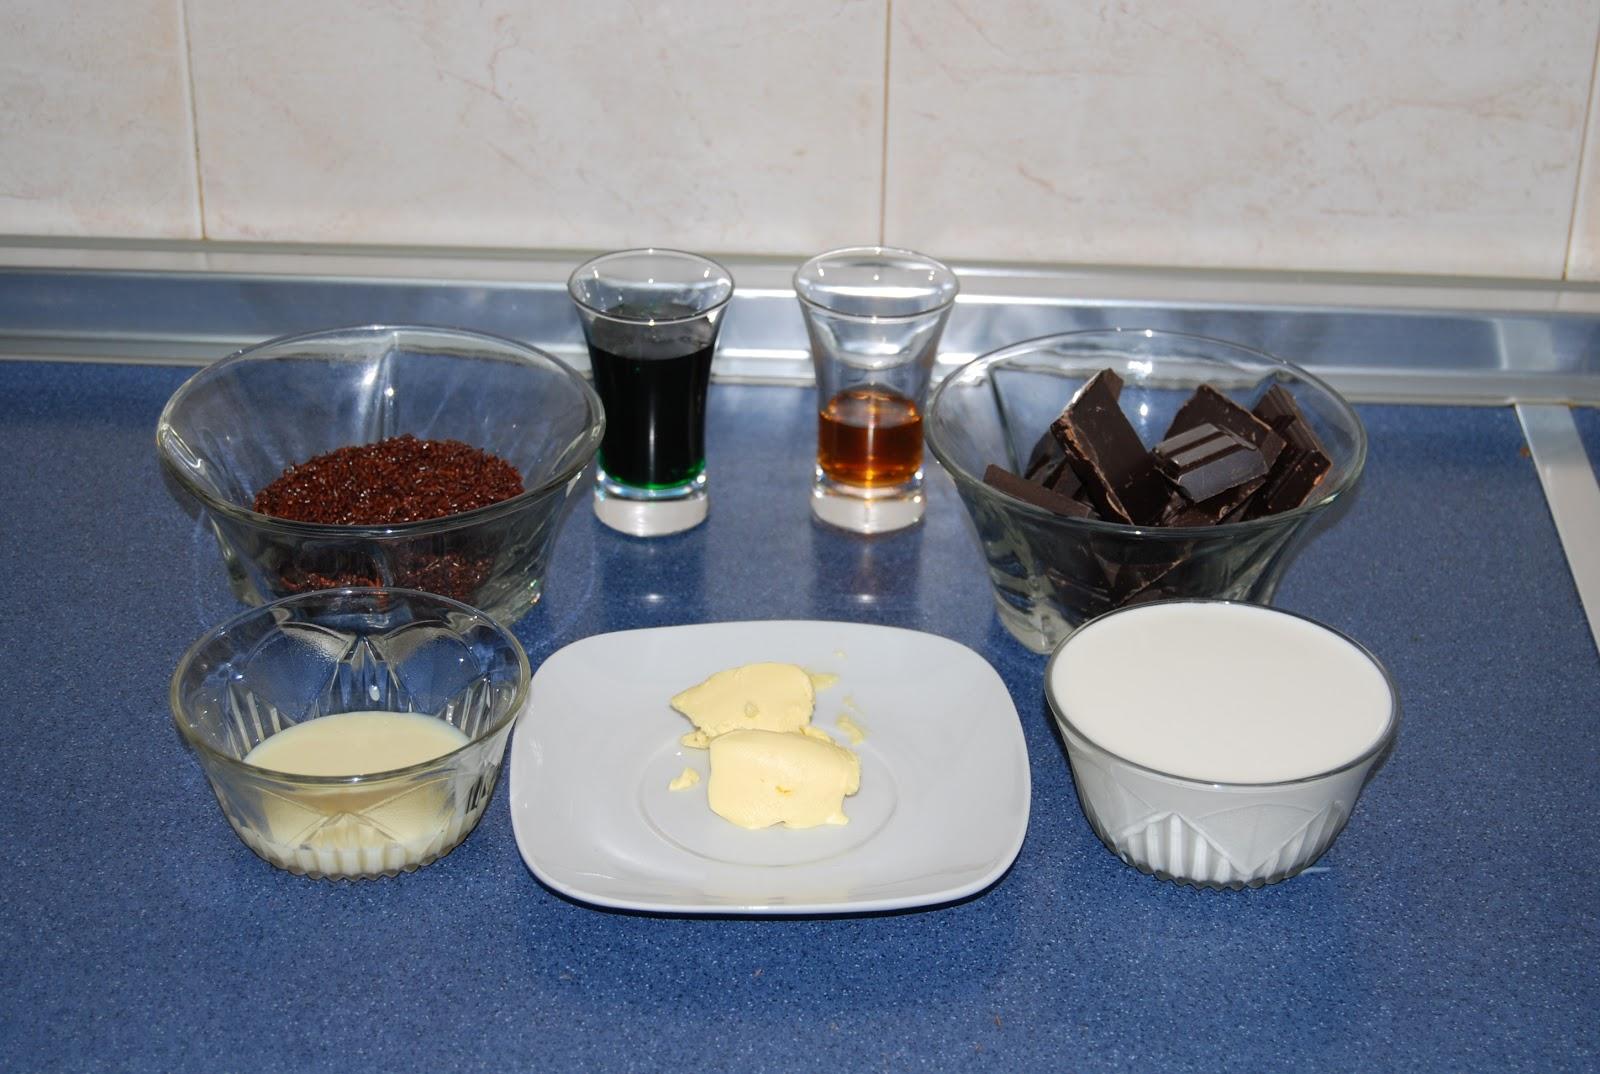 Cocina para principiantes trufas de chocolate y menta - Cocina para principiantes ...